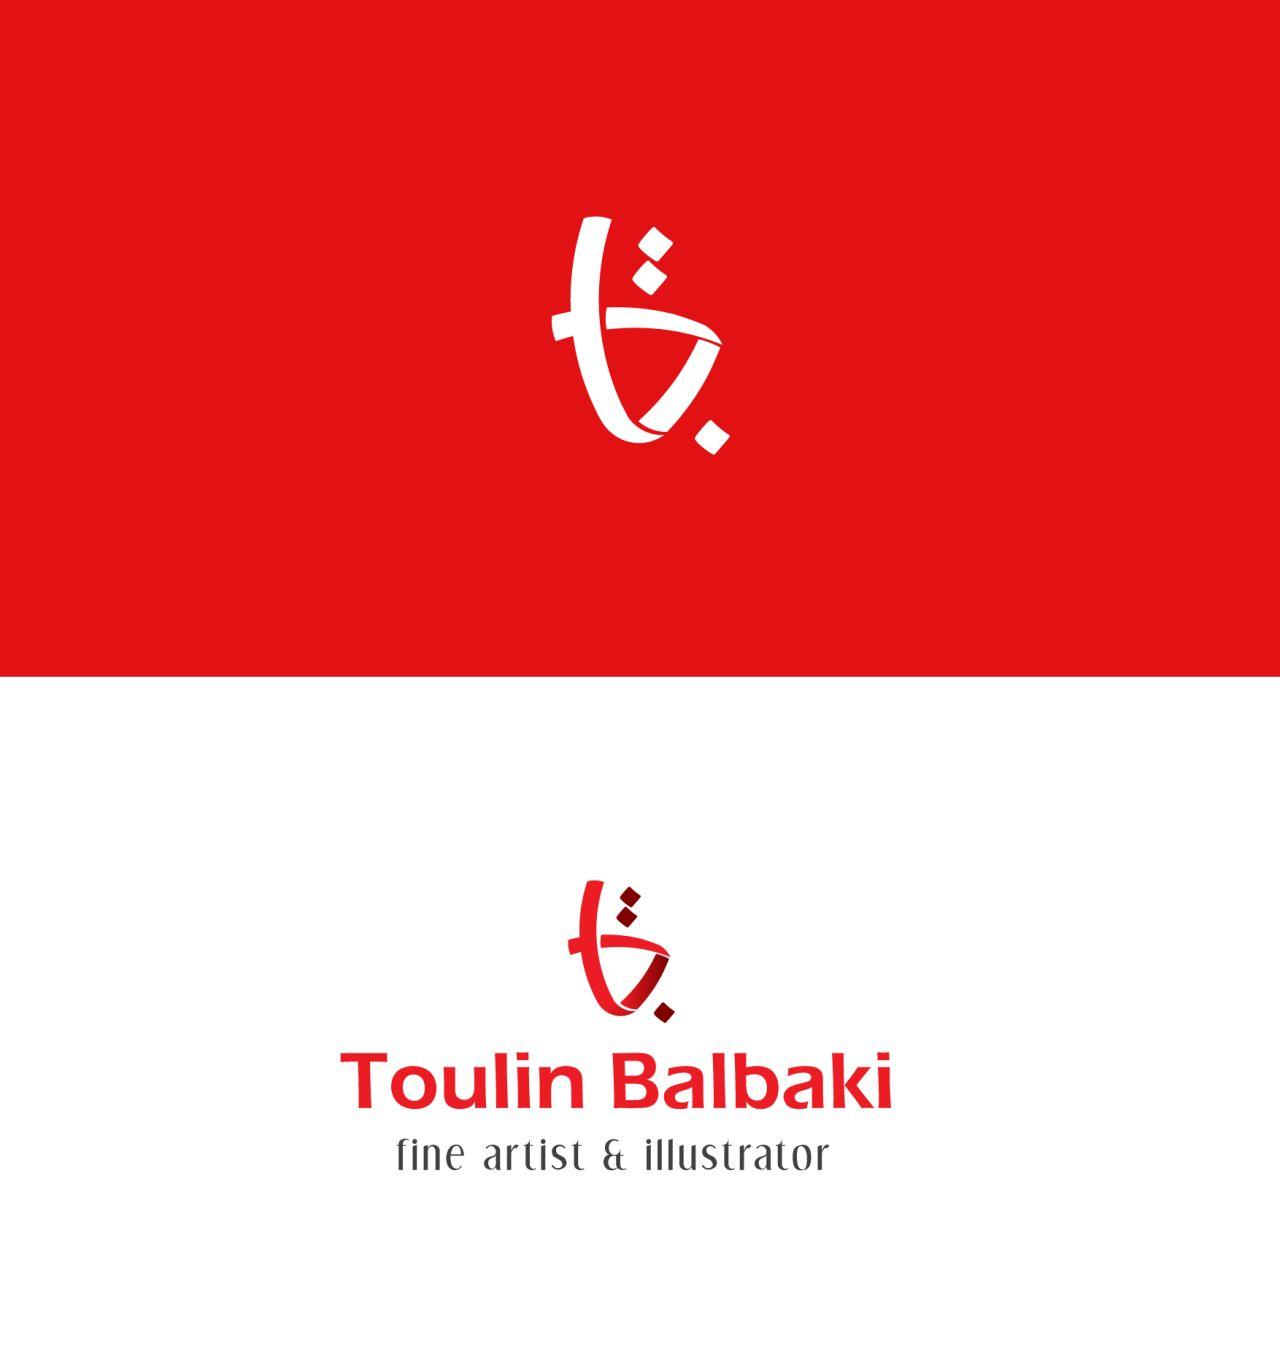 Toulin Balabaki logo in two versions.